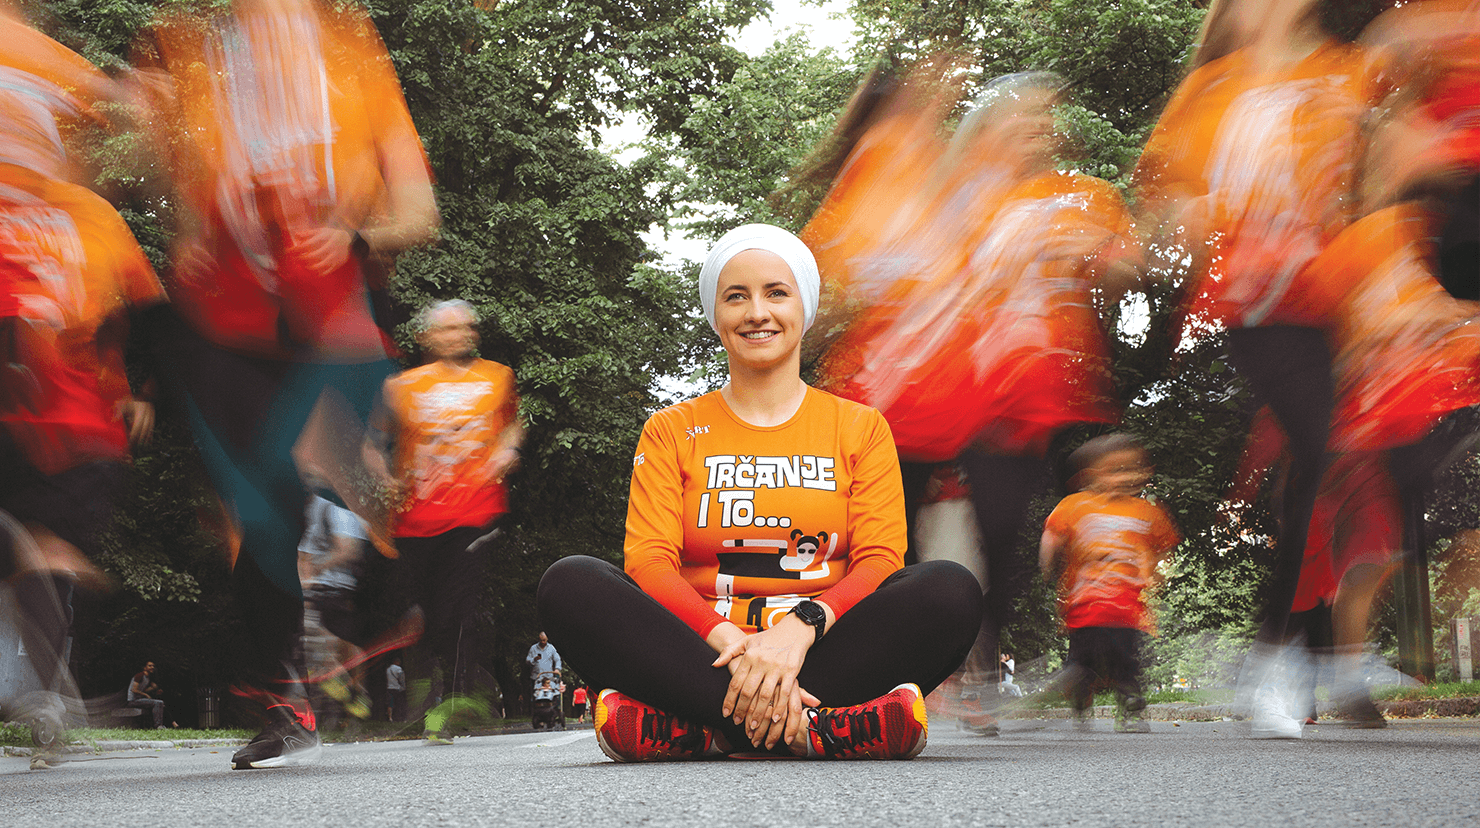 Woman in orange shirt sitting on pavement